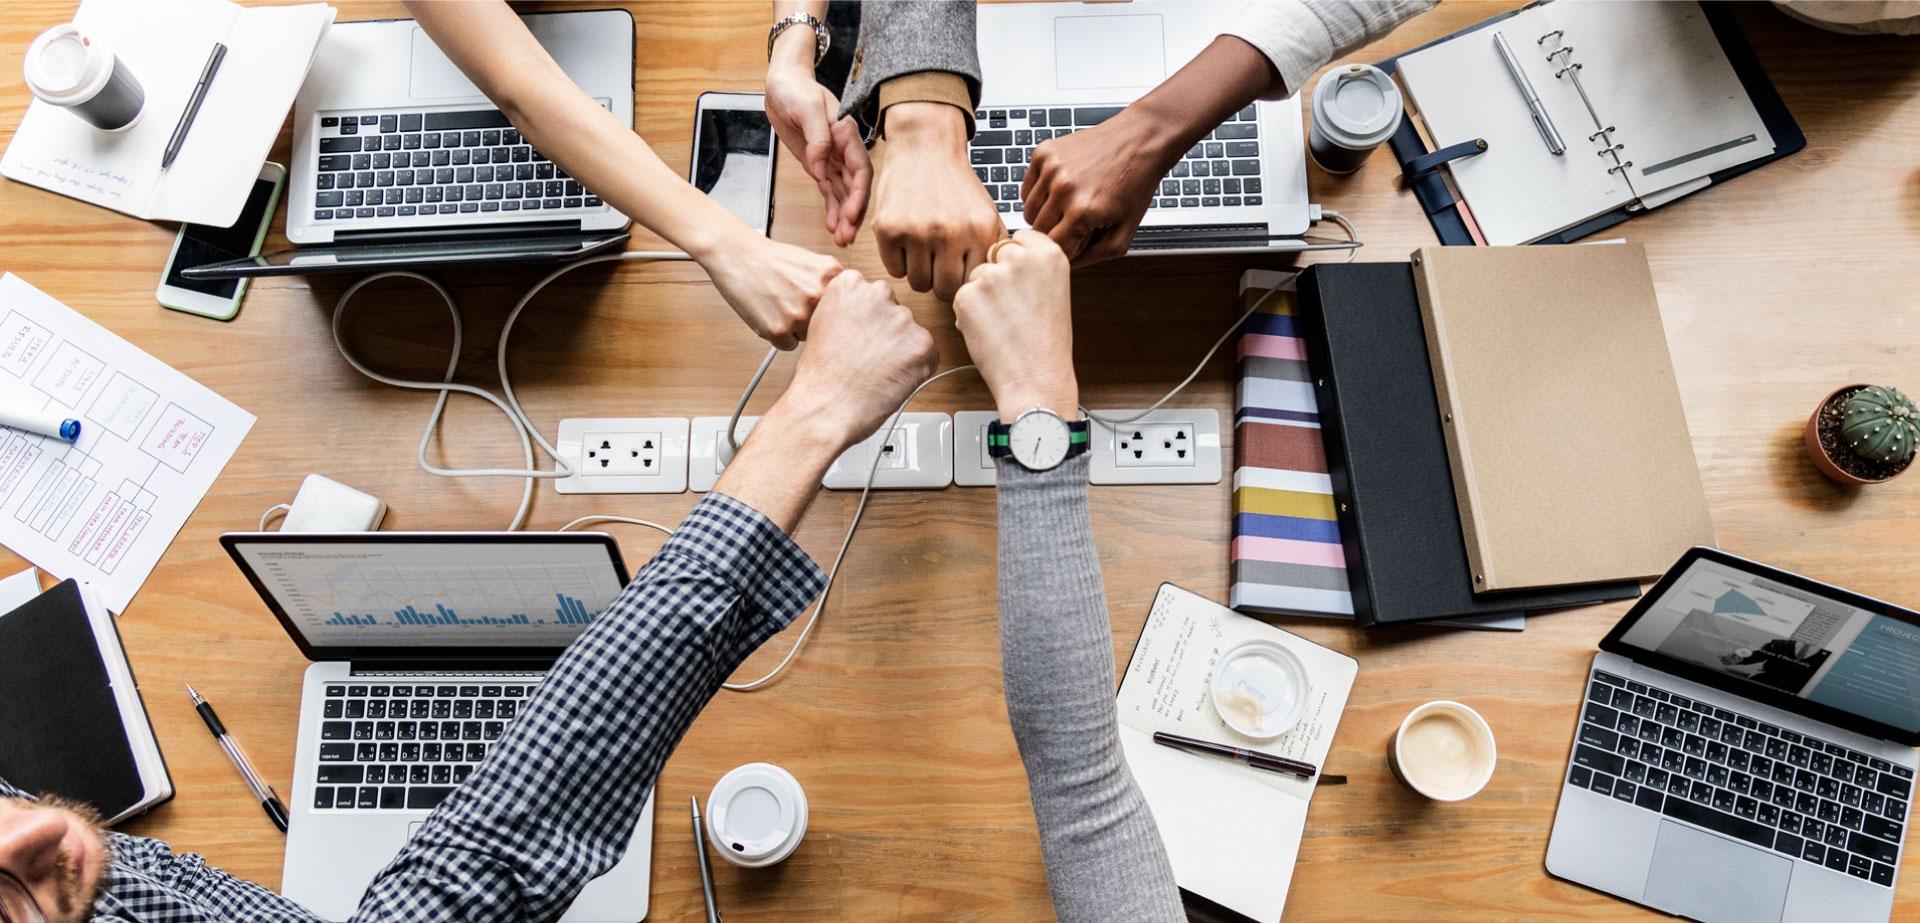 O-Ecossistema-de-Startups-e-a-Nova-Economia-EASYCASE